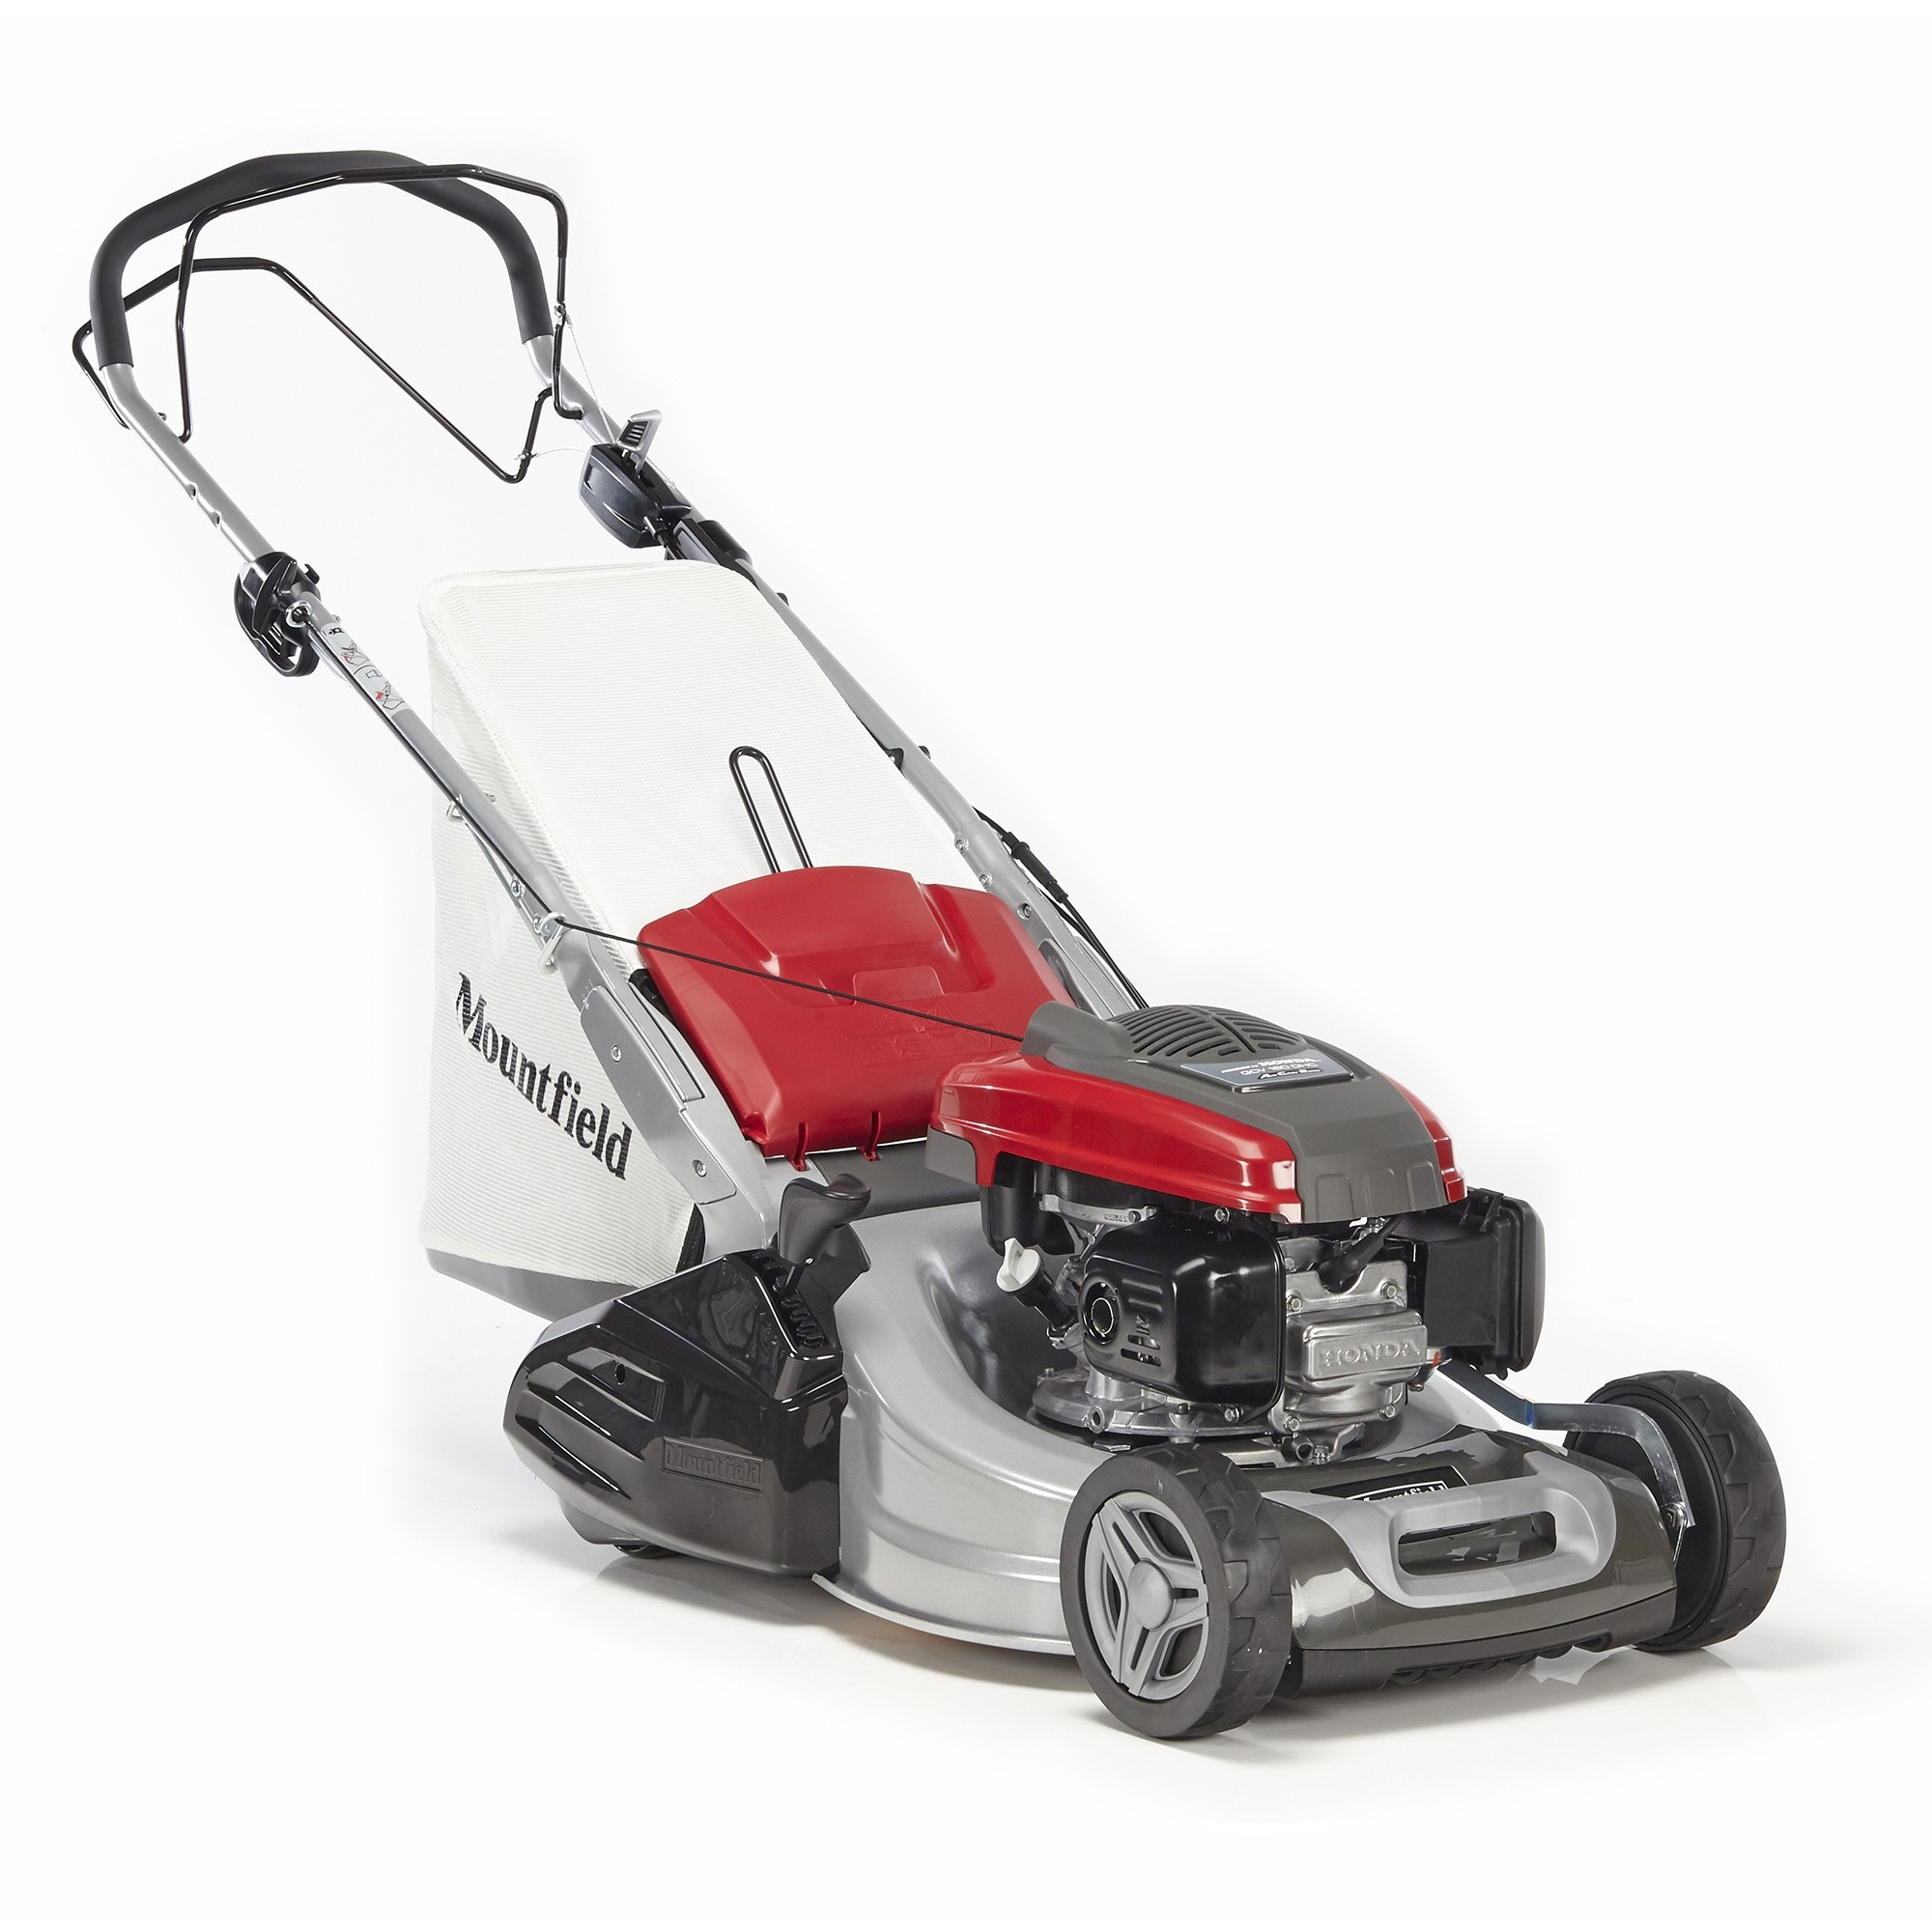 sp505r lawnmower